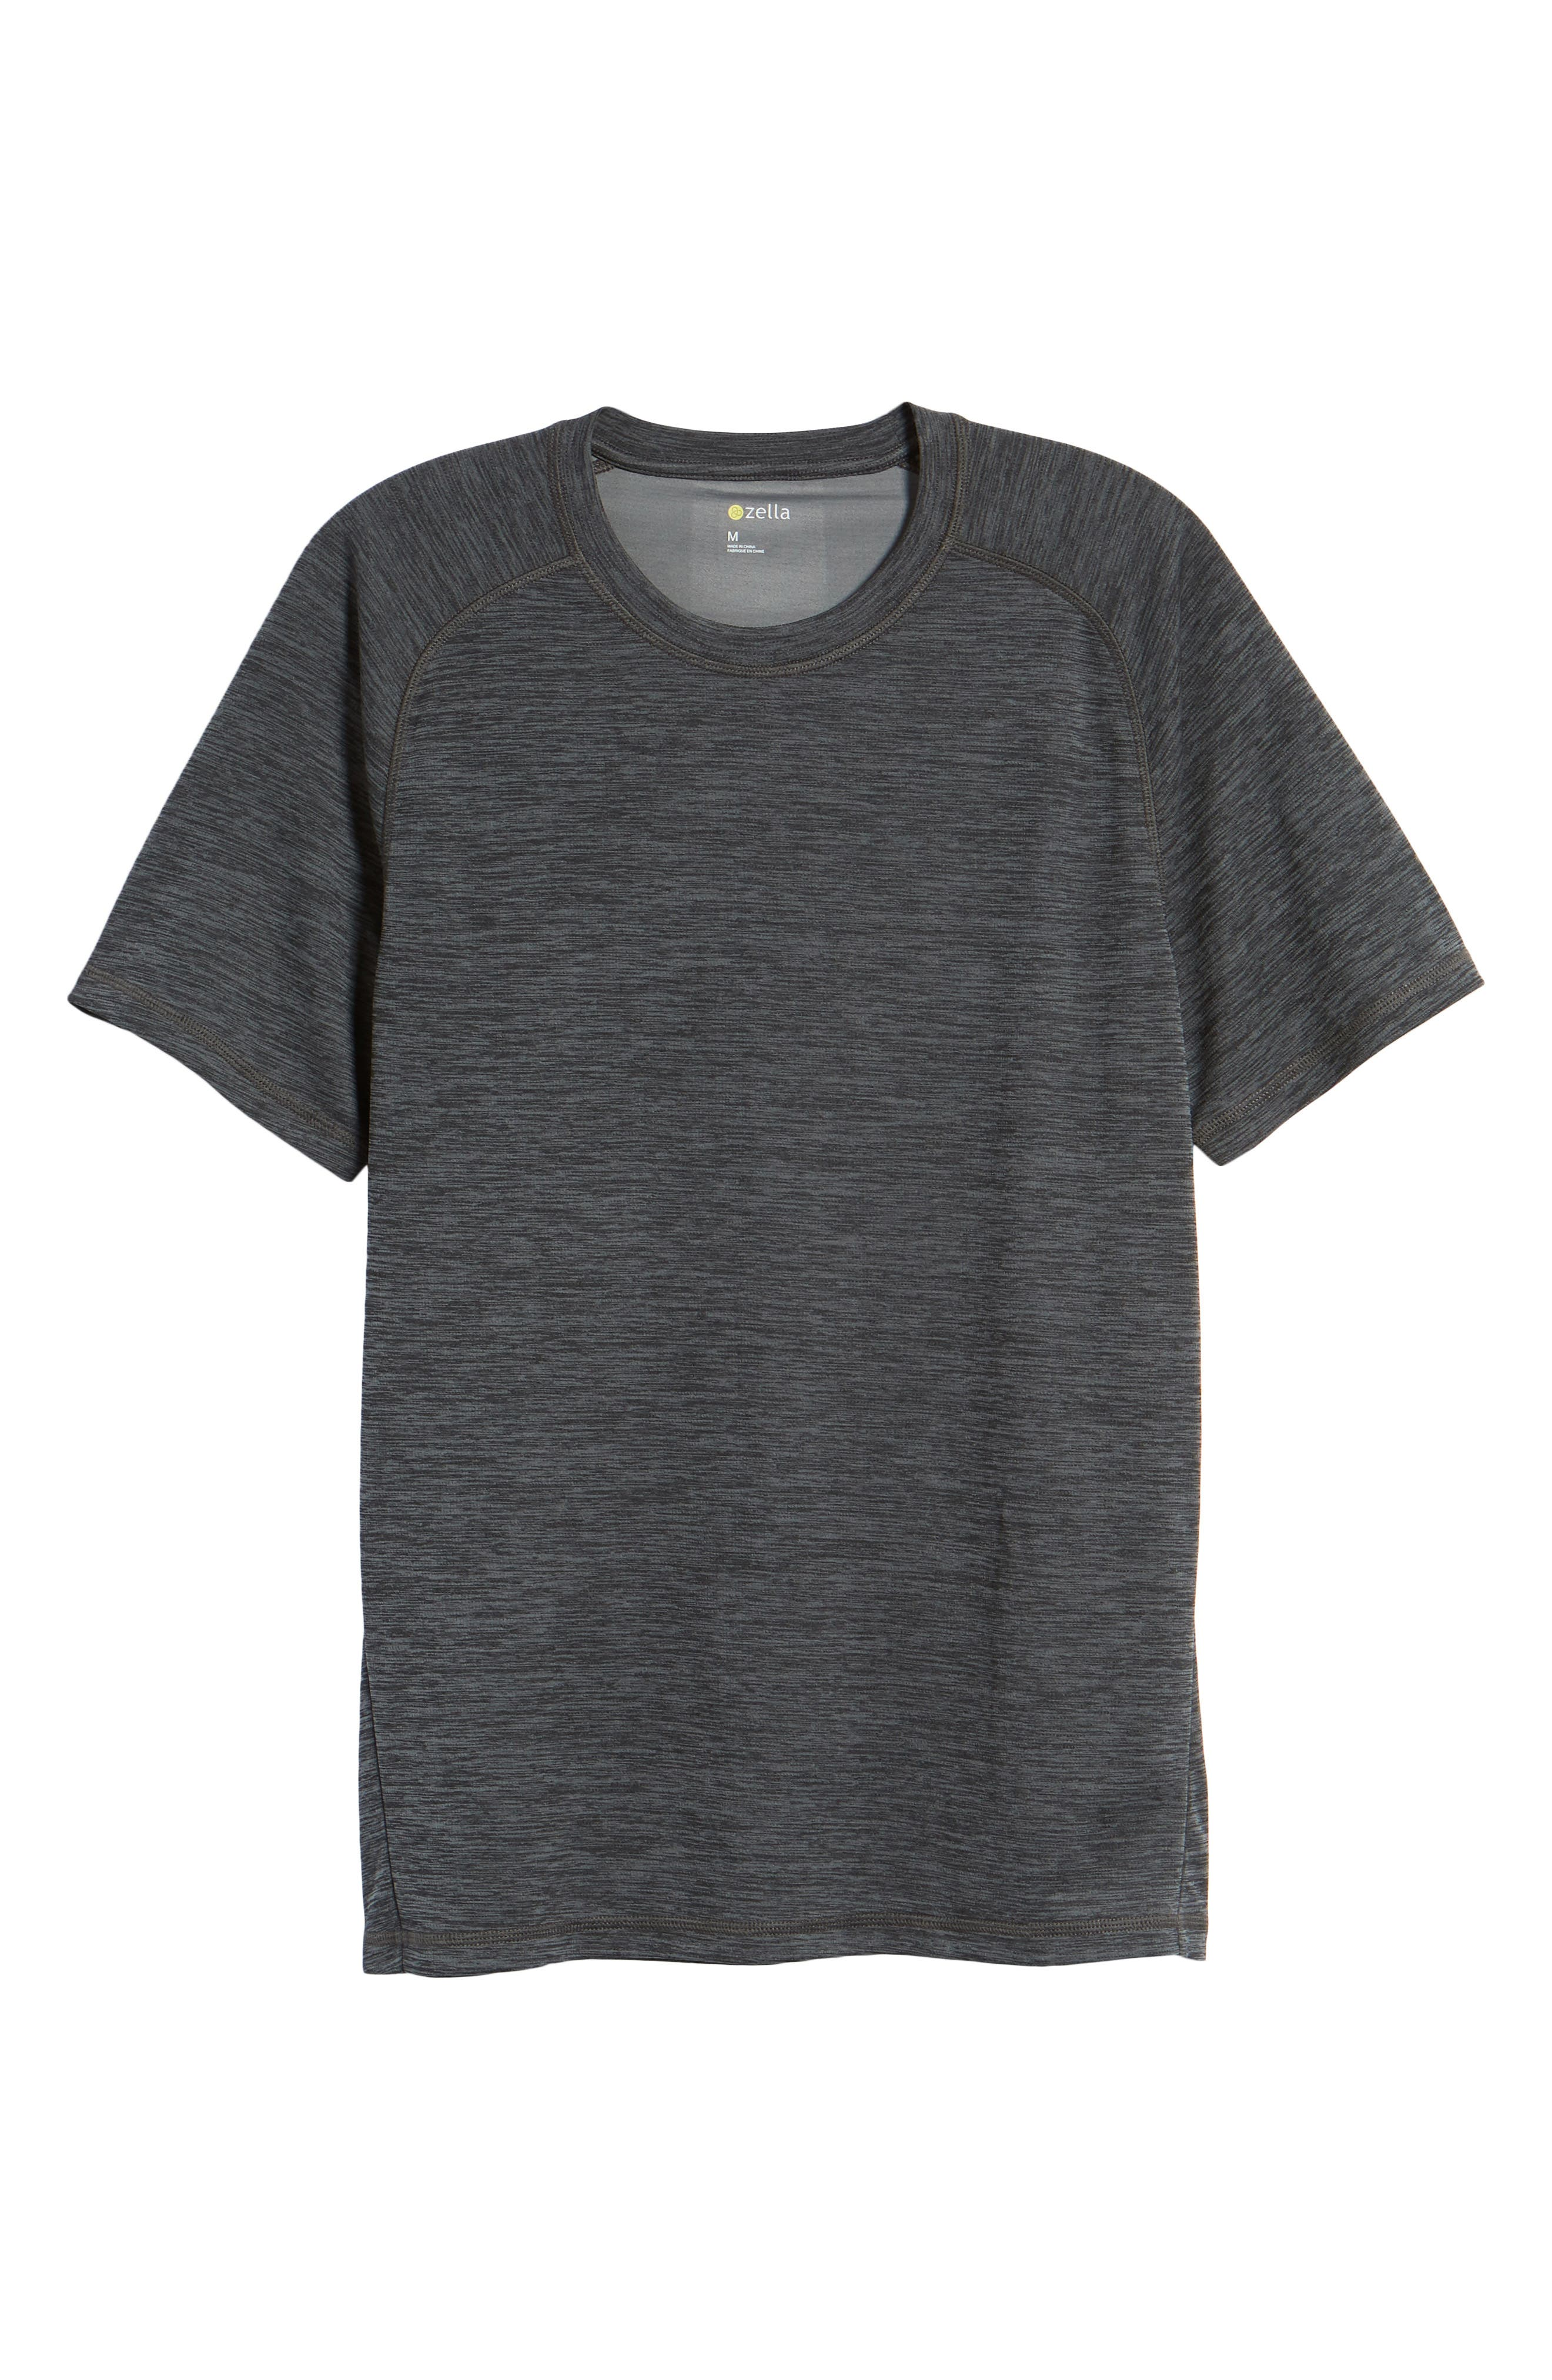 Kinoite Raglan Crewneck T-Shirt,                             Alternate thumbnail 6, color,                             GREY OBSIDIAN MELANGE